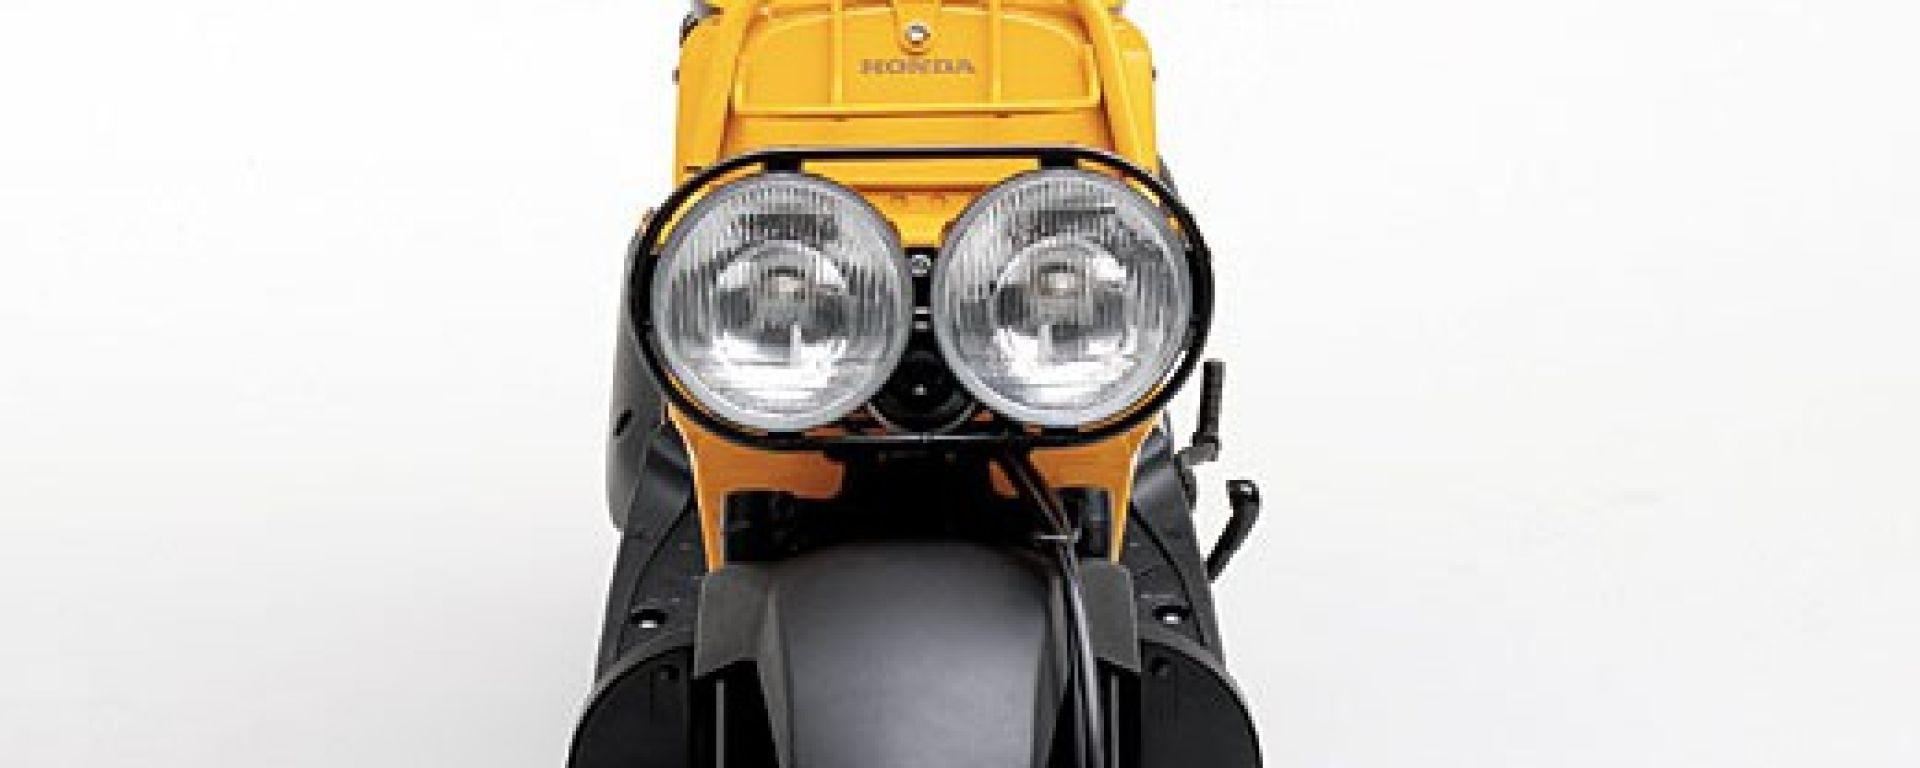 Nuovi incentivi per i ciclomotori